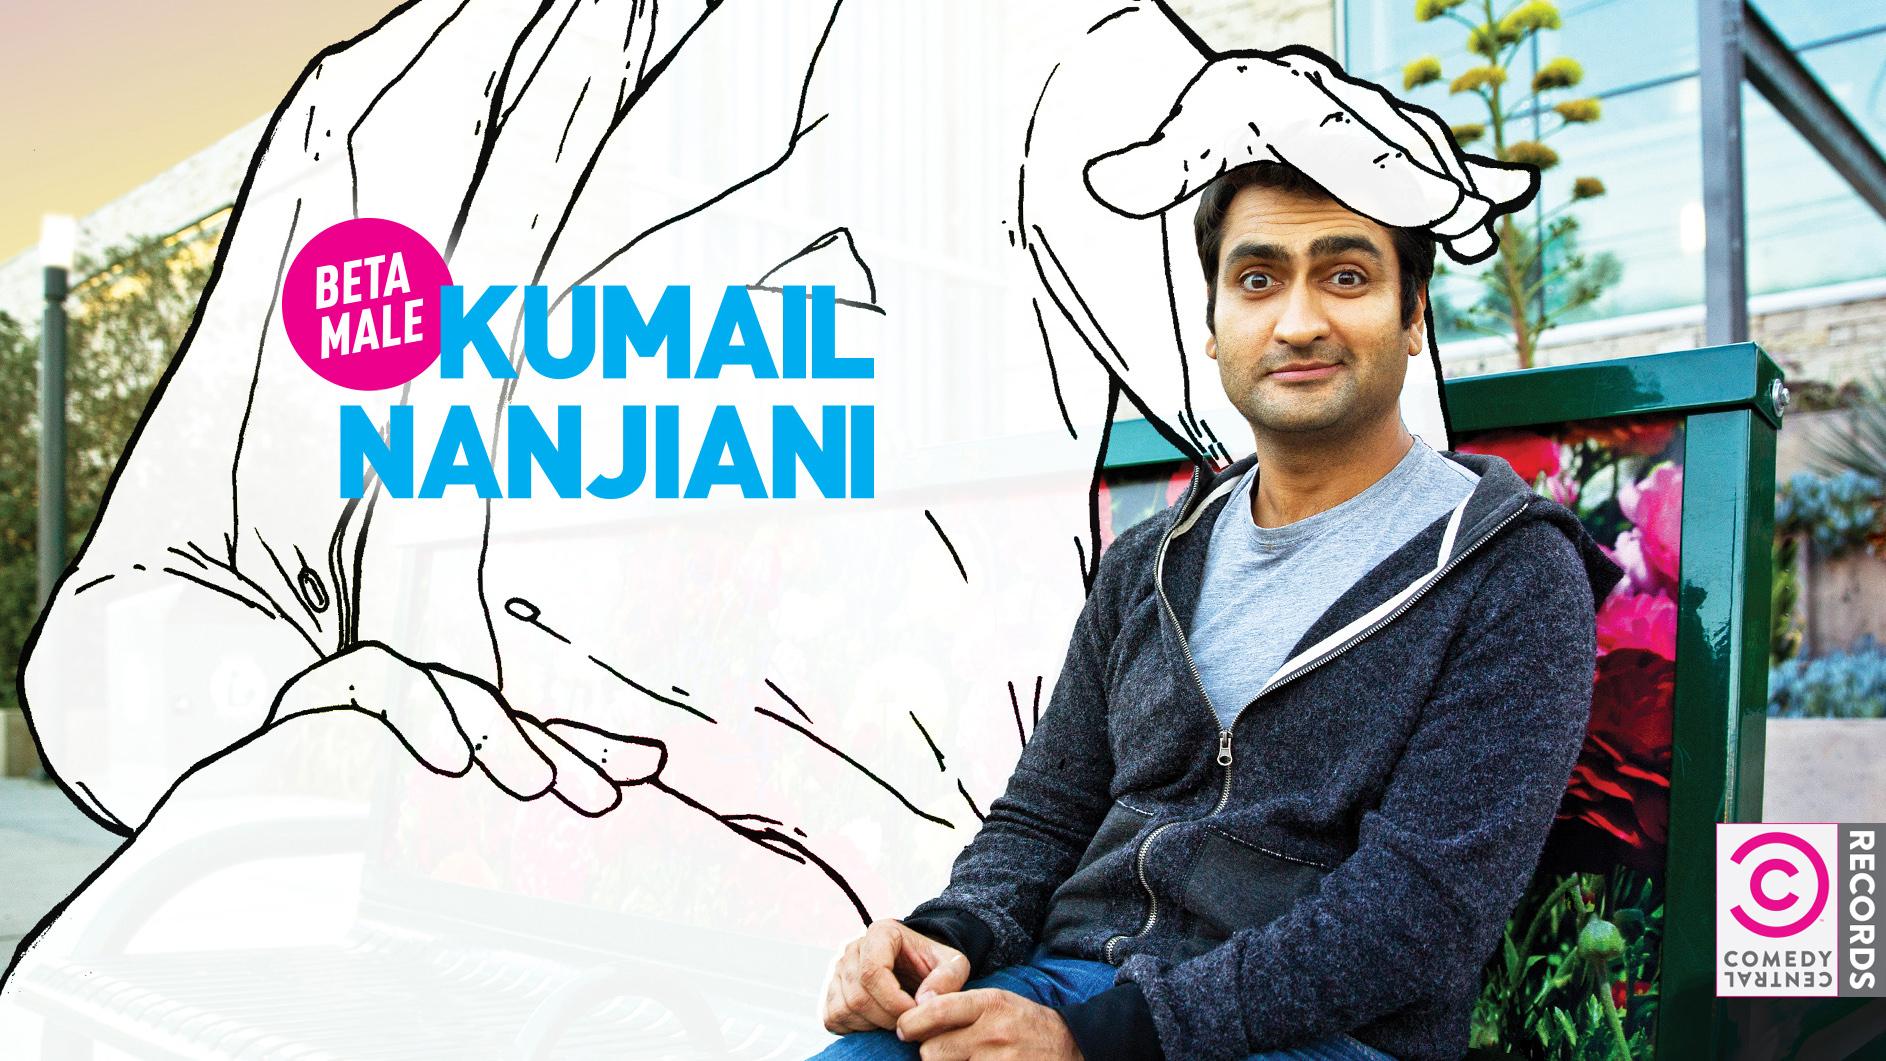 Kumail_Nanjiani_Beta_Male_1920x1080.jpg